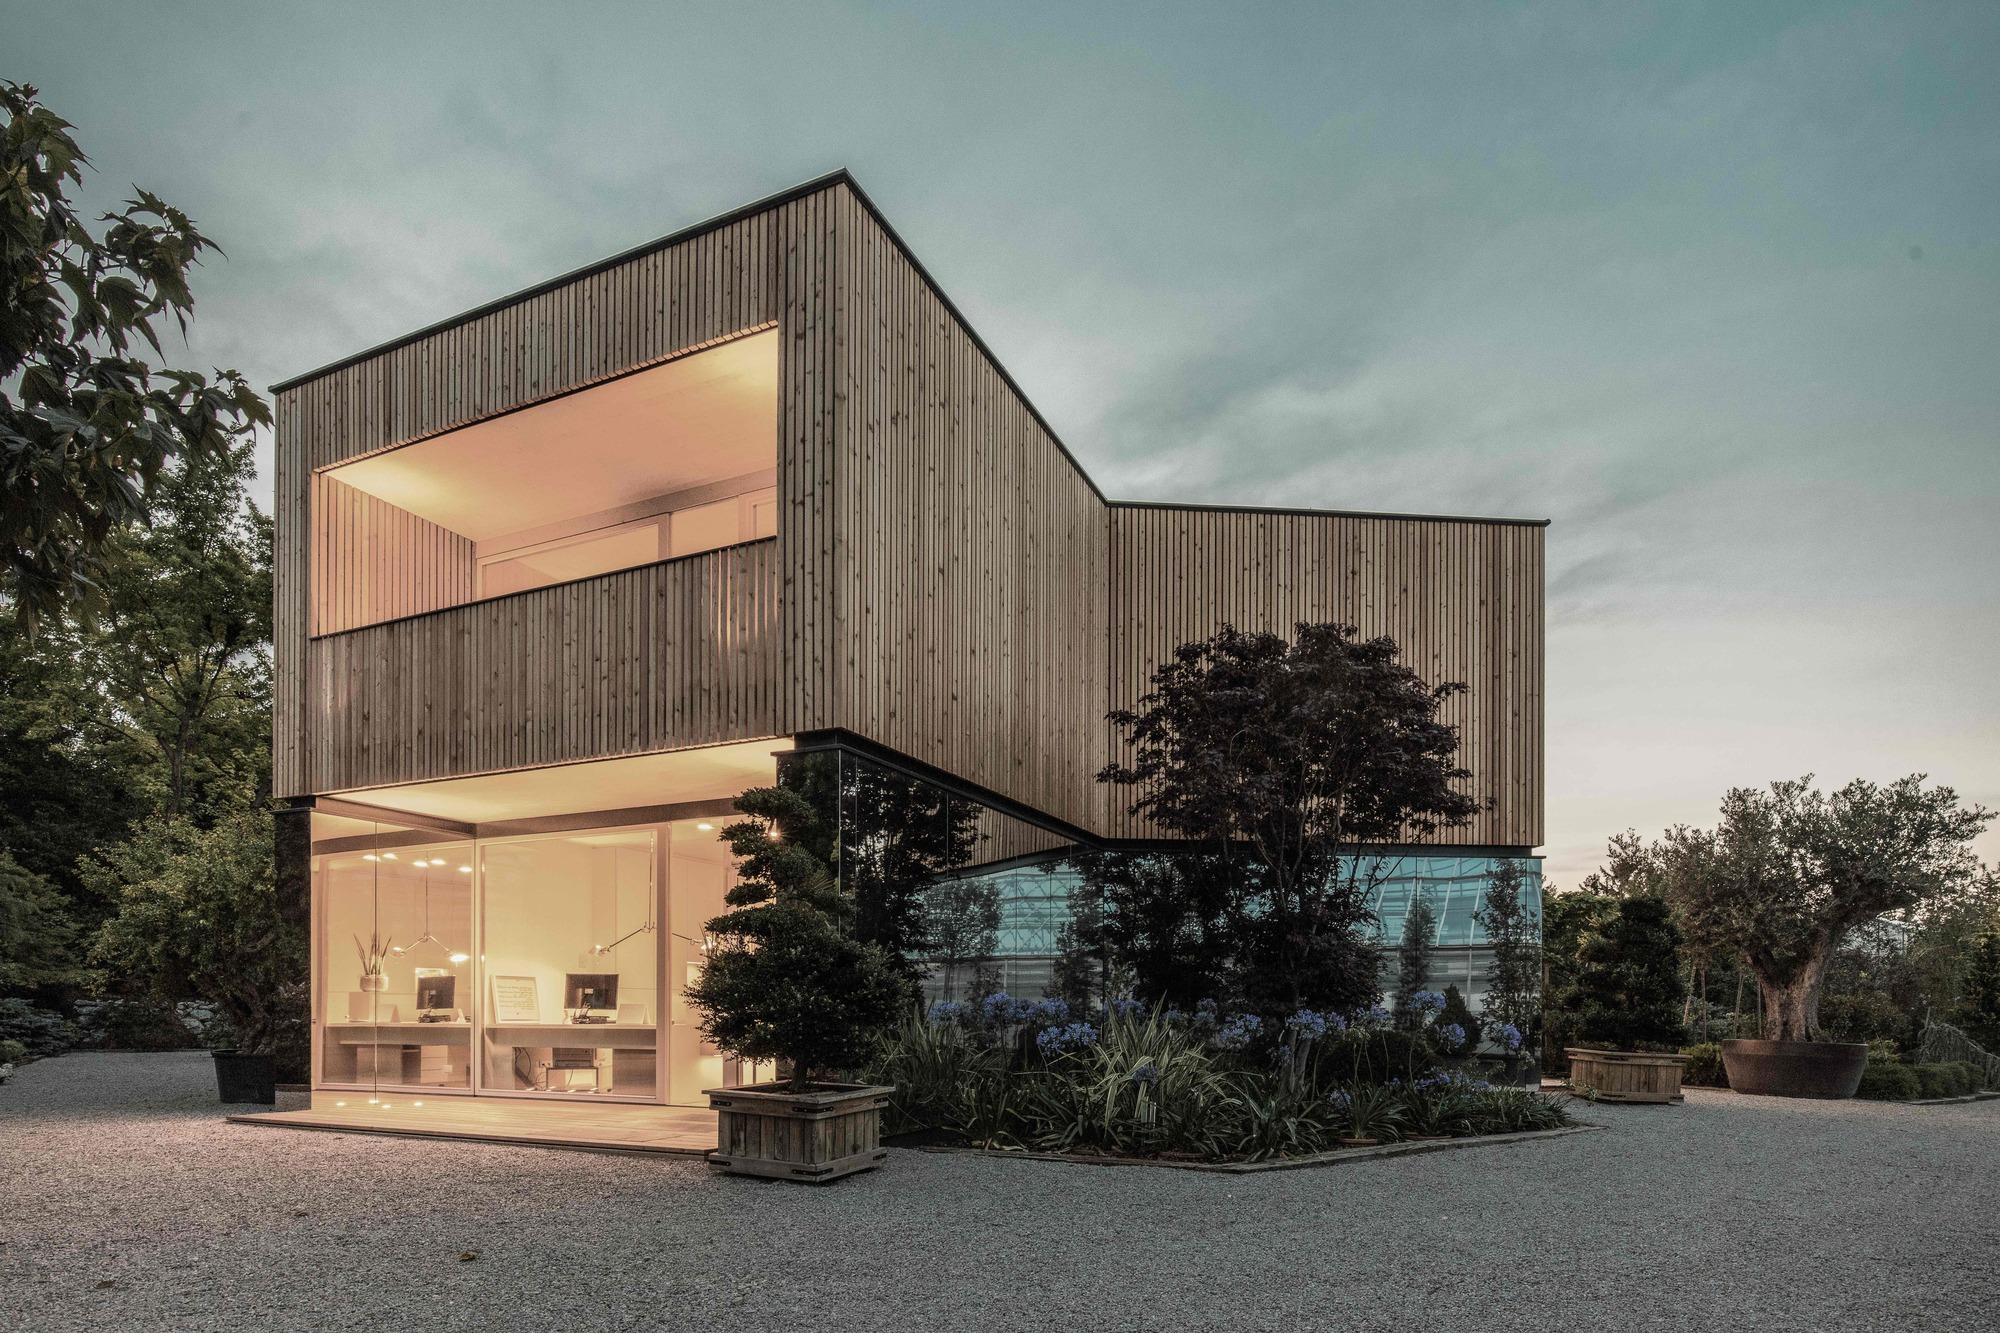 Wood Architecture: 52 Cubic Wood / JOSEP + Atelier Haumer